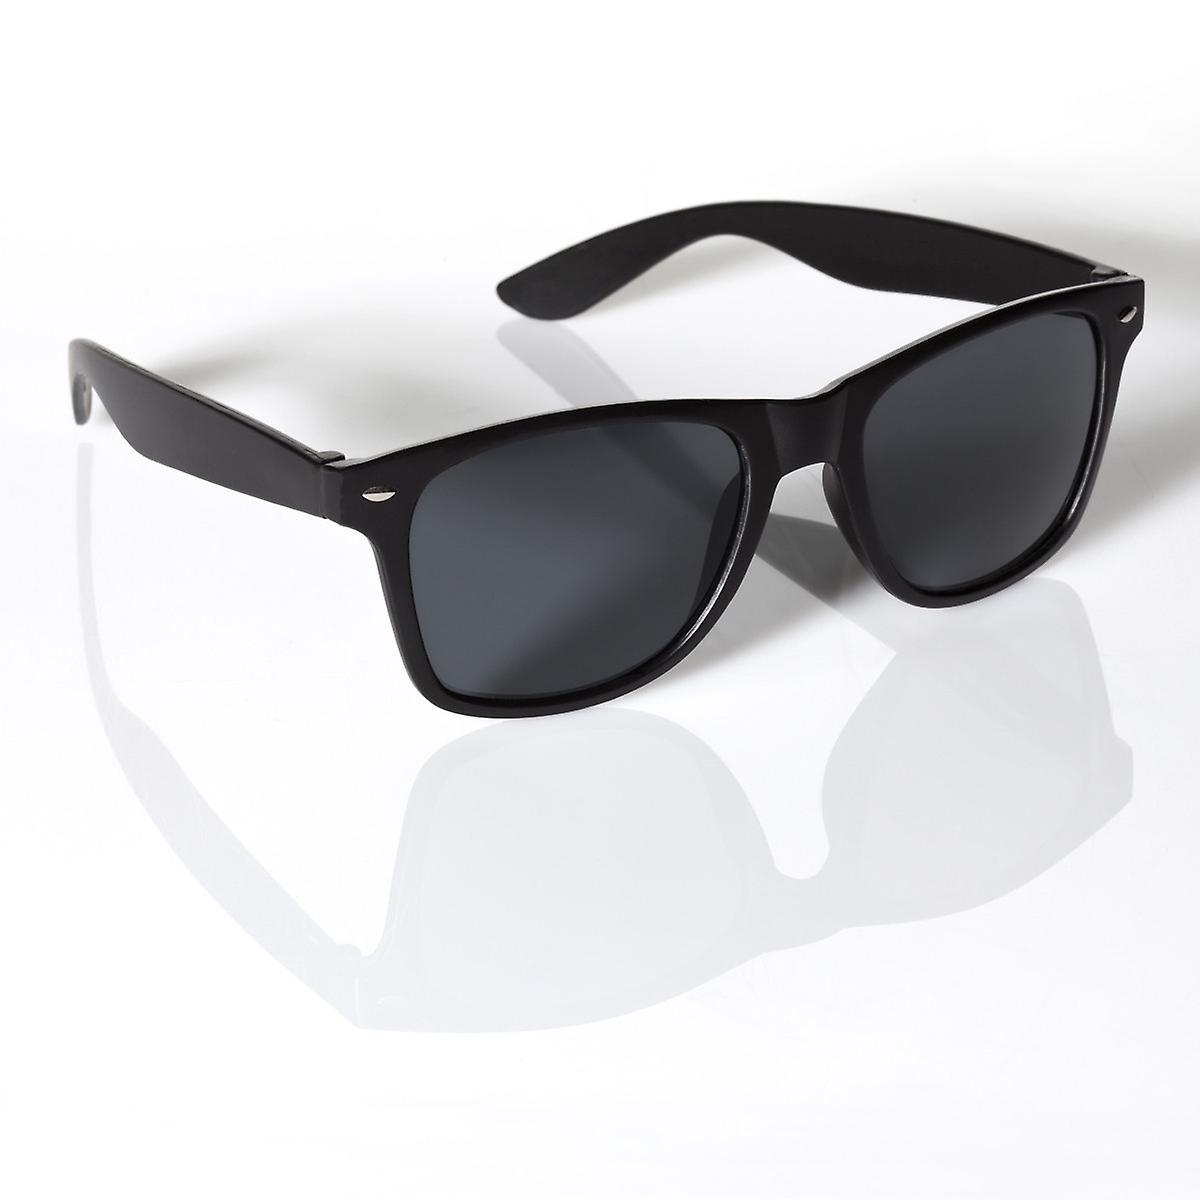 BLACK WAYFARER SUNGLASSES UV400 UNISEX RETRO 80'S geek shades aviator classic